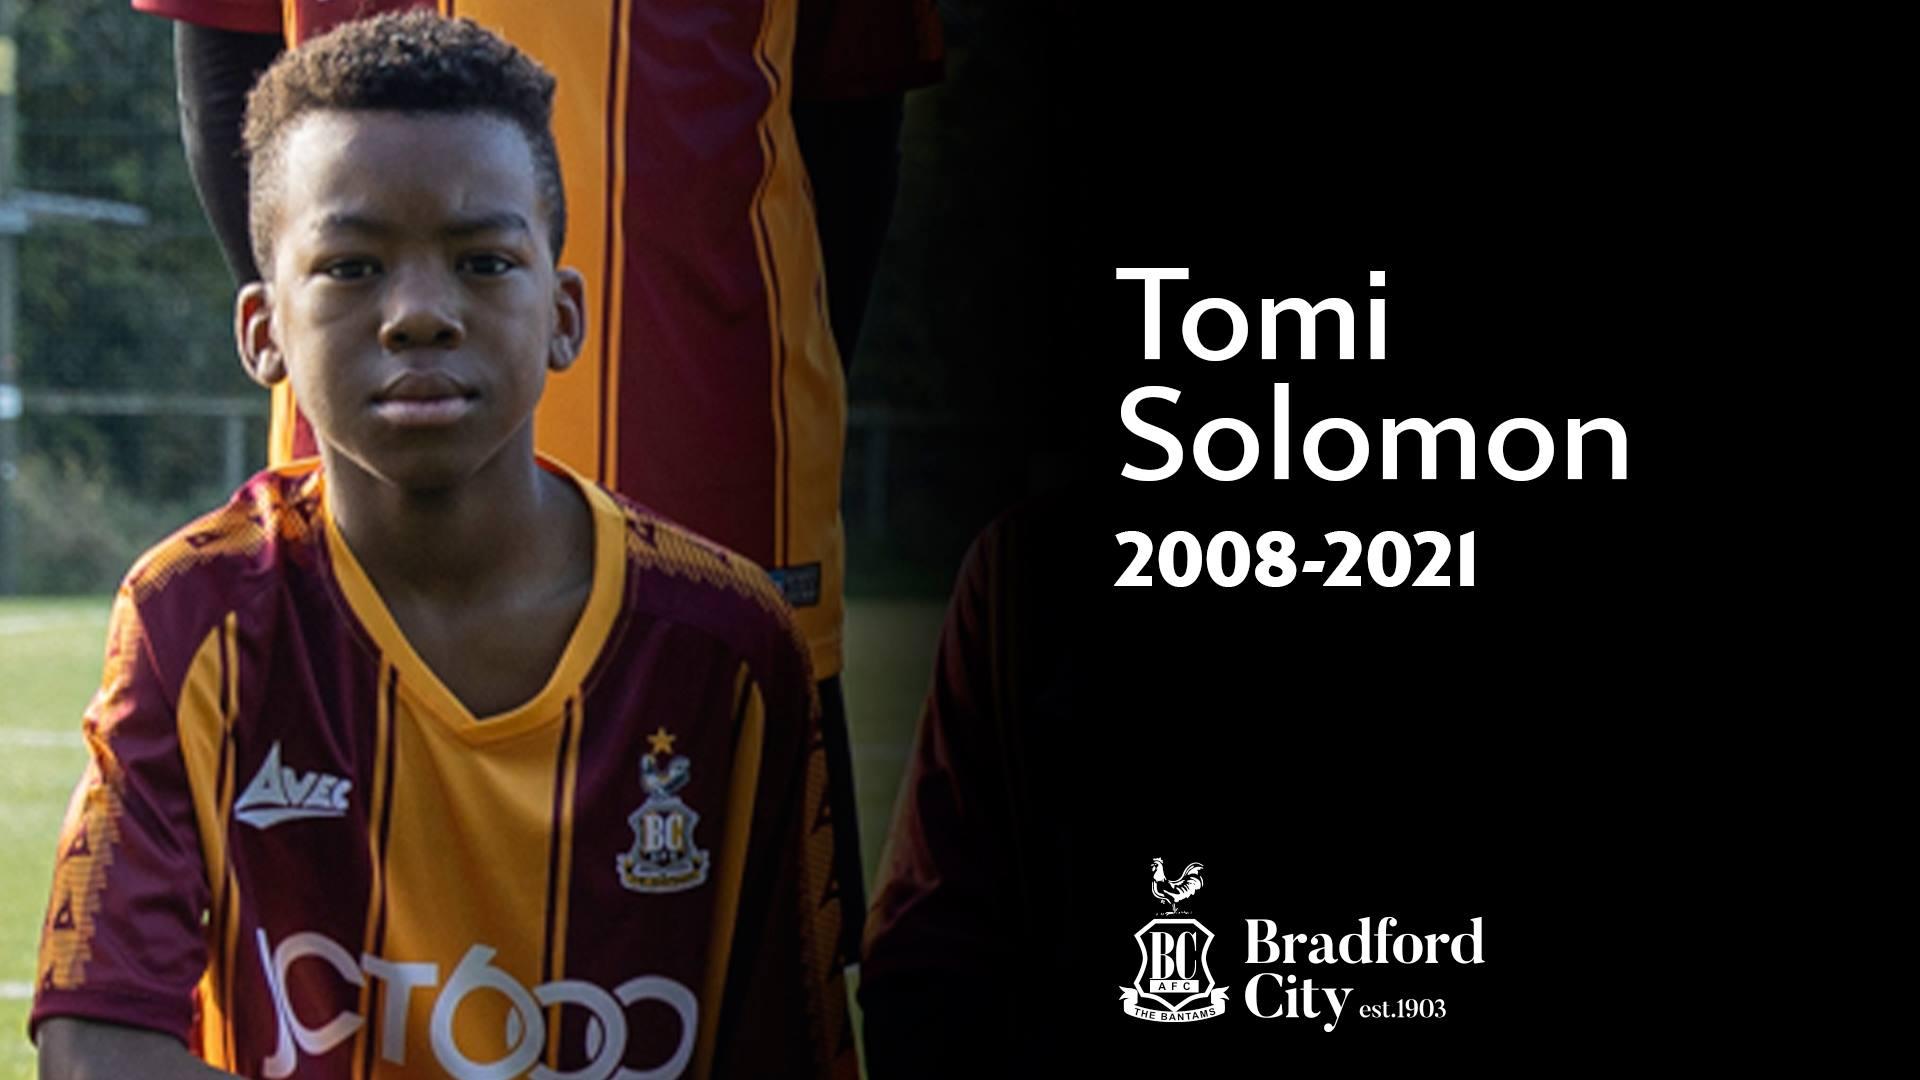 Tomi Solomon